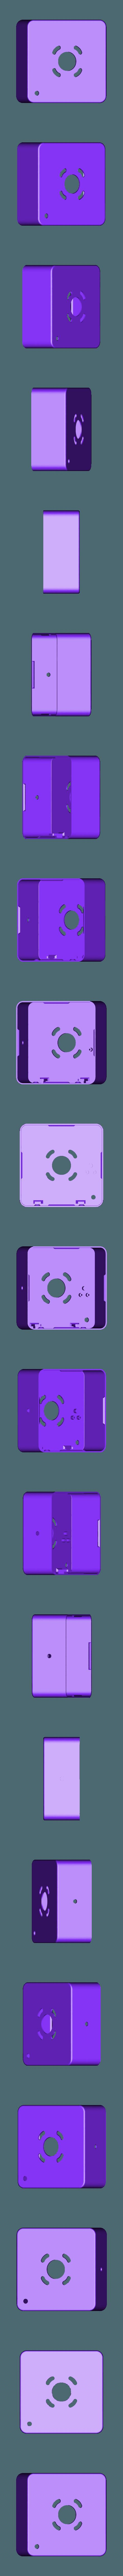 bigmac-case.stl Download free STL file Circuit Playground Sound Box • 3D printable object, Adafruit